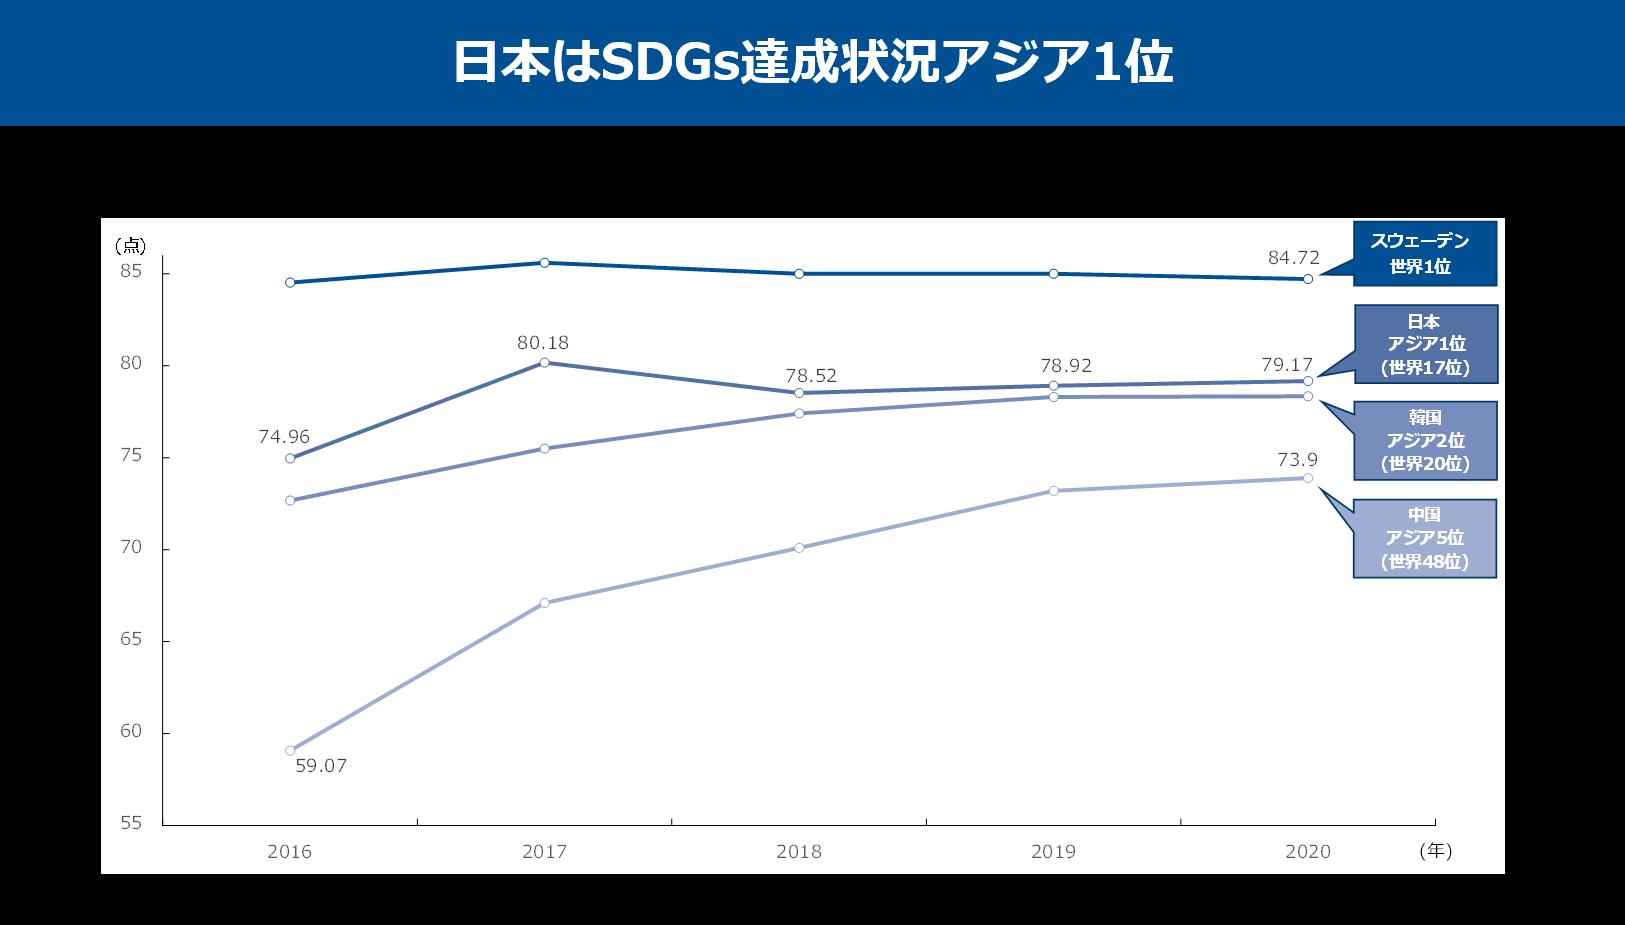 SDGs,アジア,SDGs達成状況